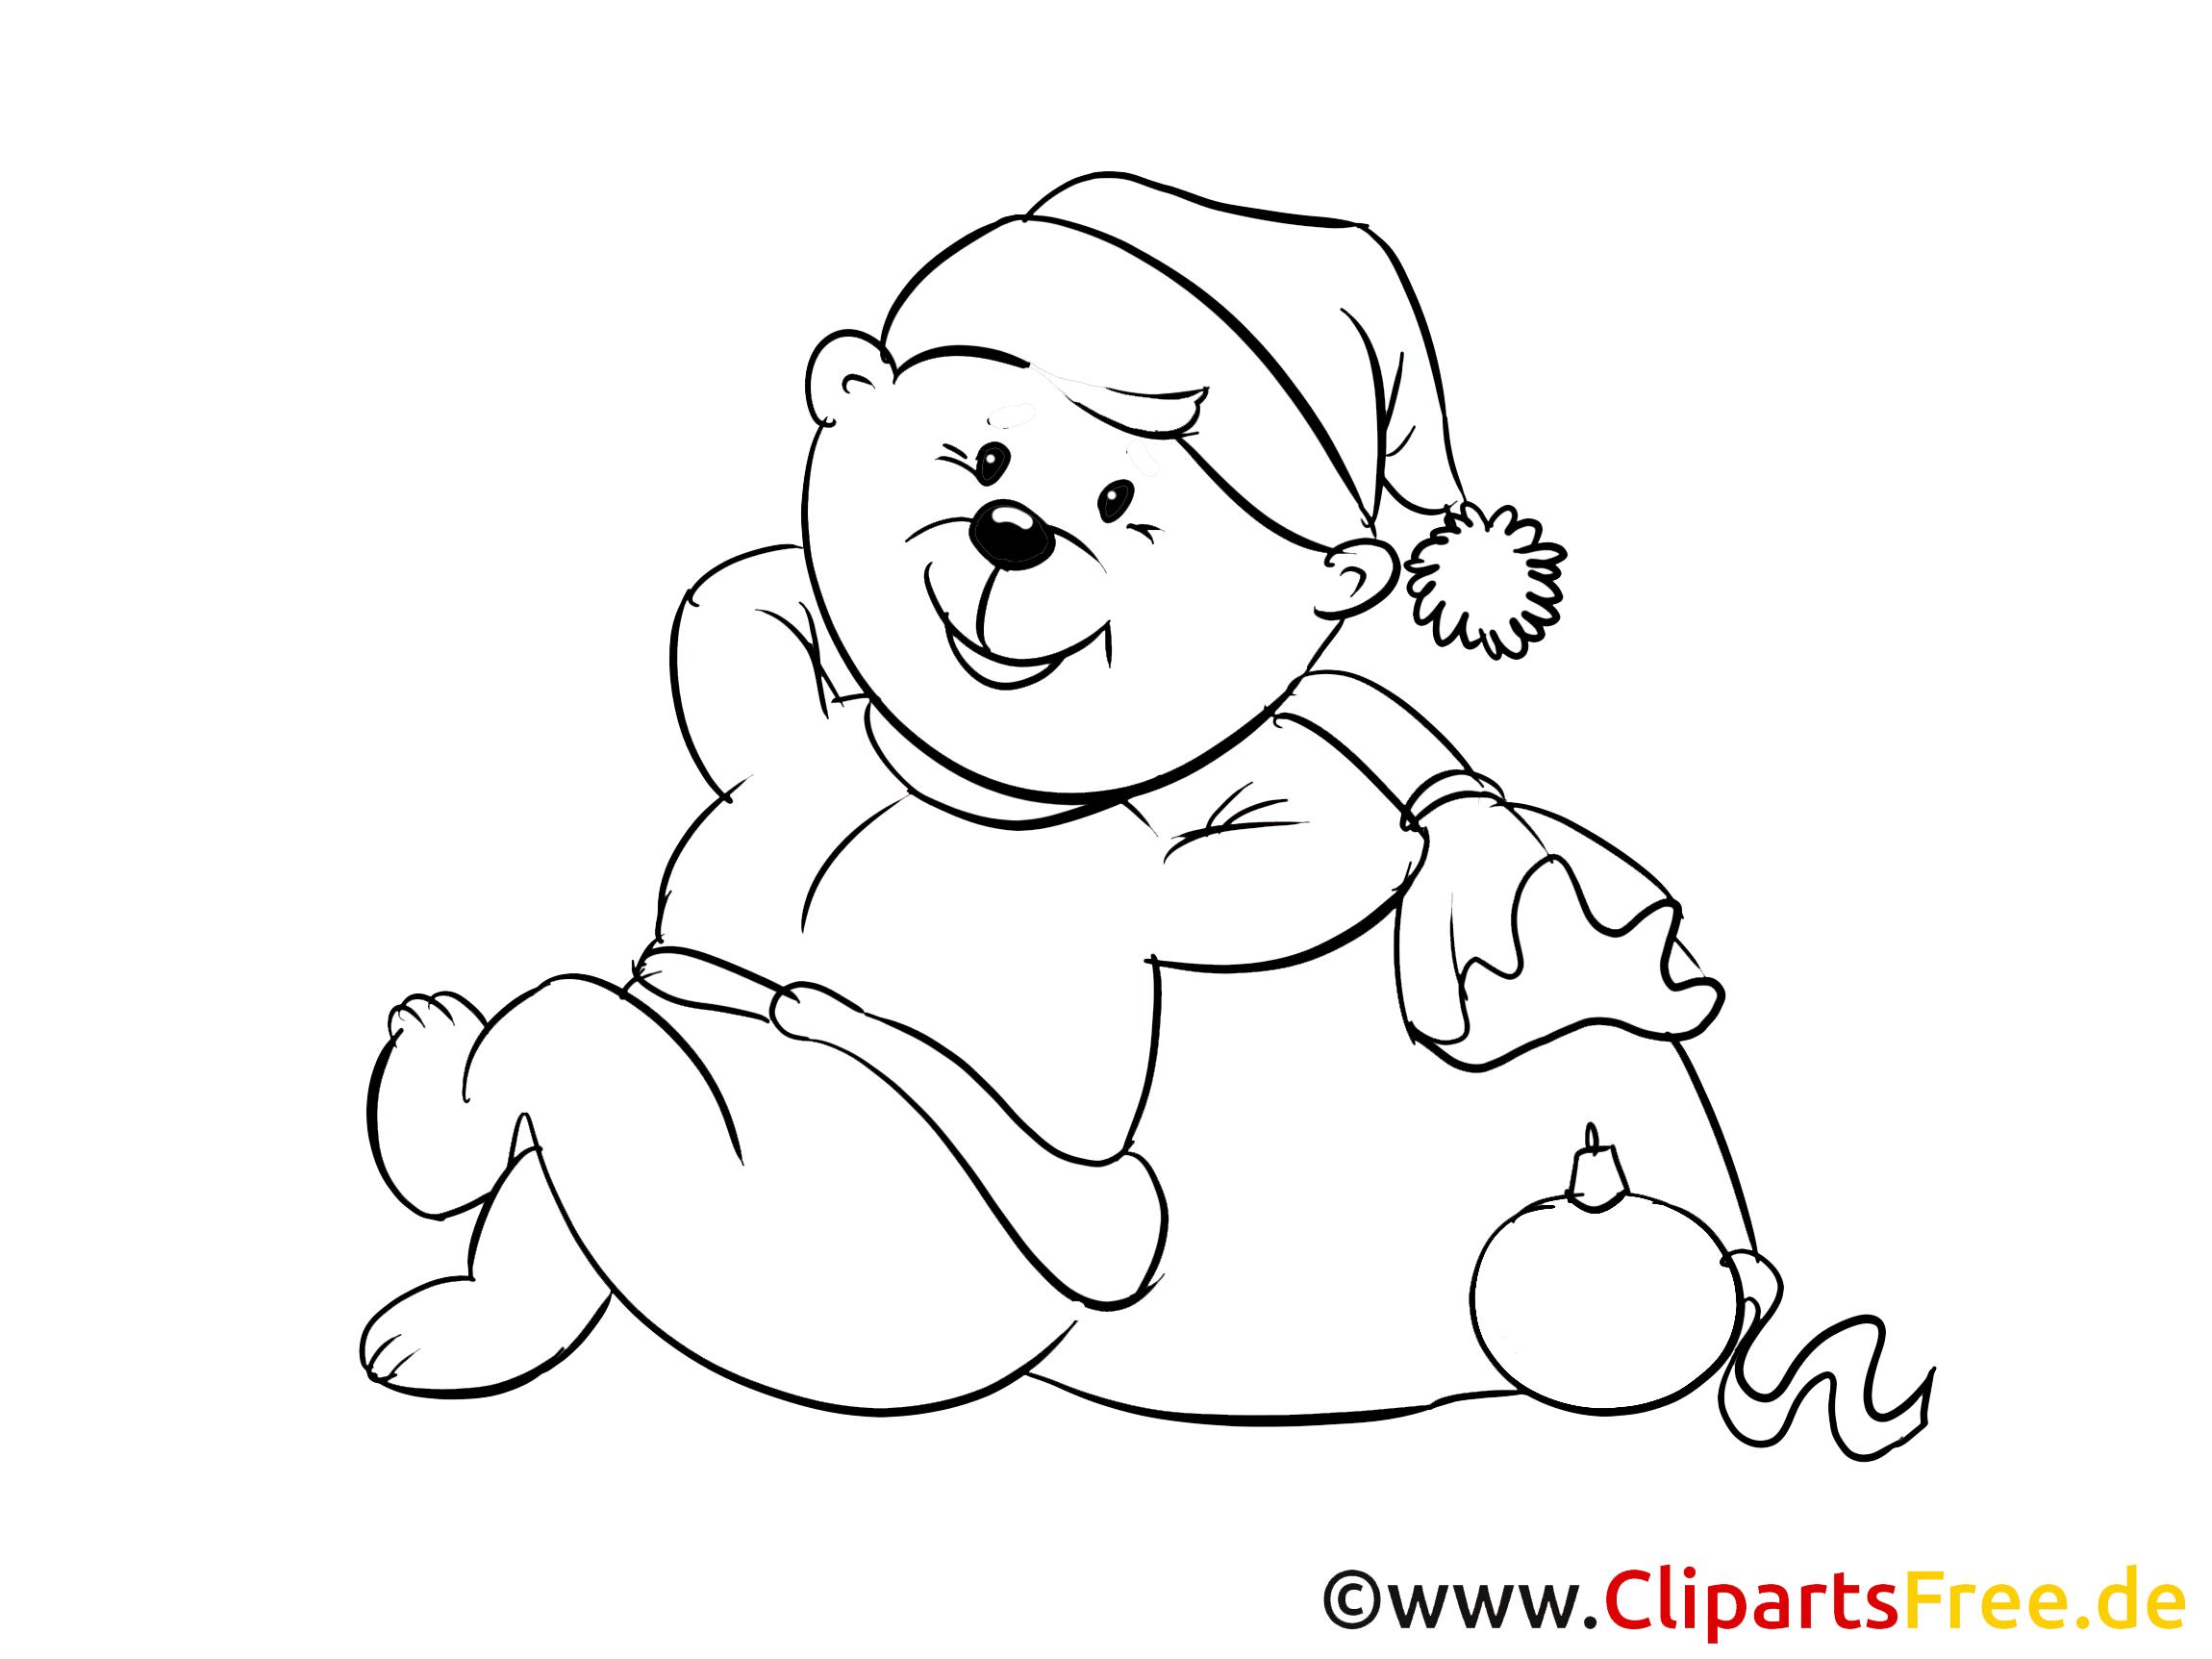 silvester teddy zum ausmalen